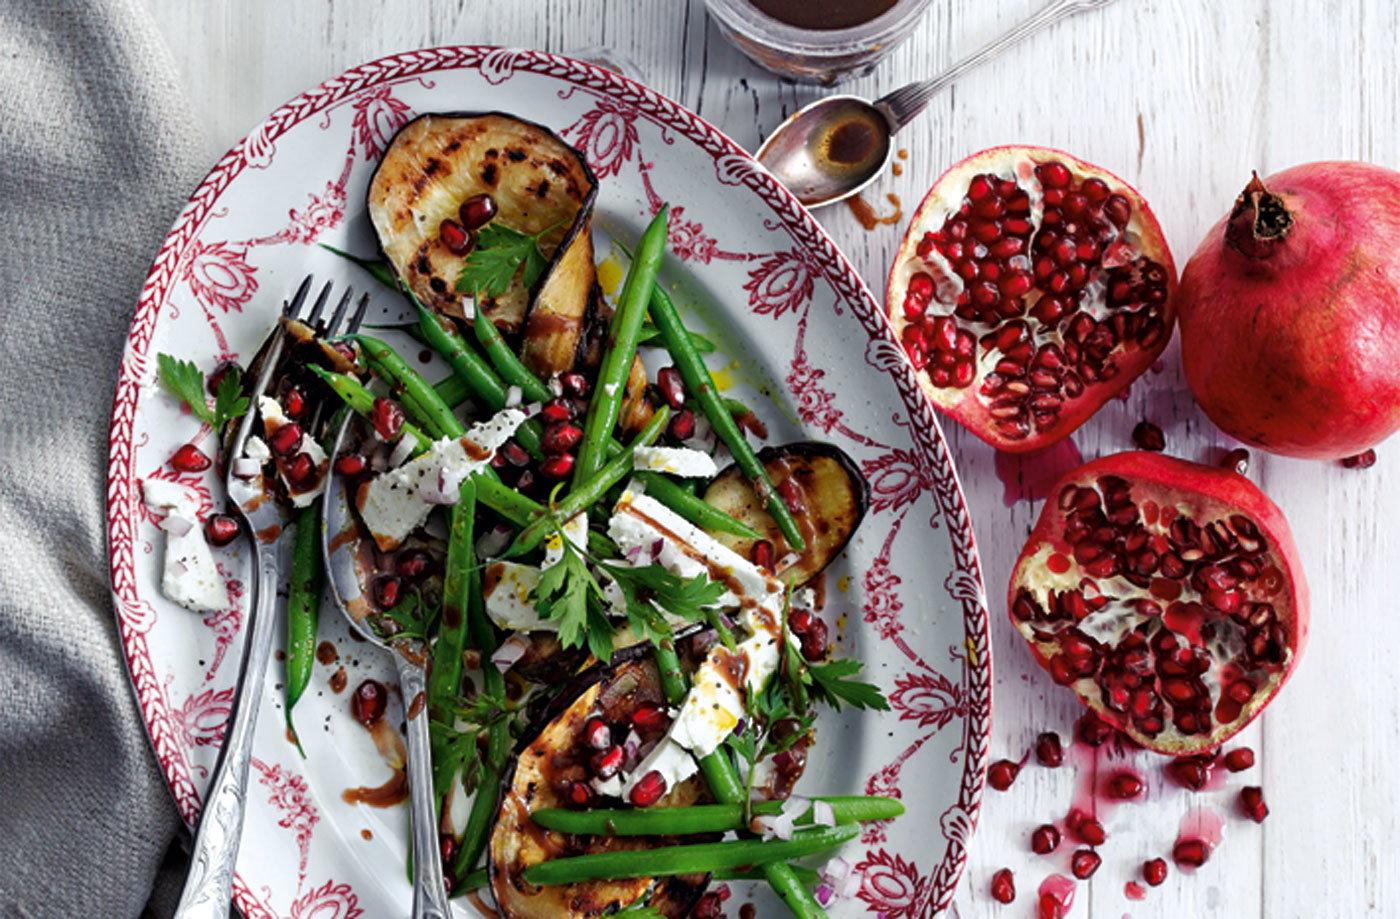 Grilled Eggplant With Pomegranate Vinaigrette Recipes — Dishmaps